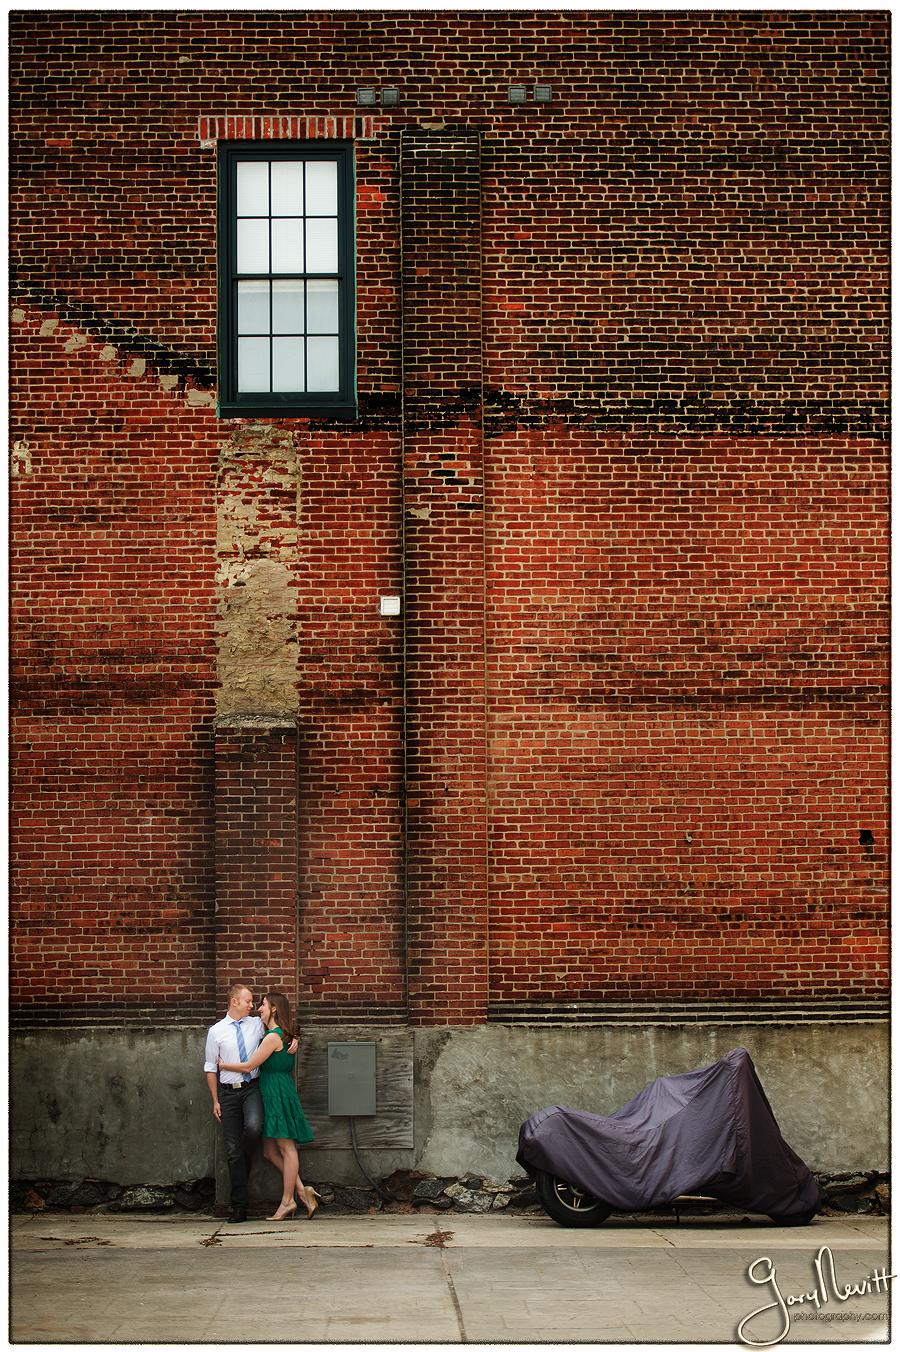 Occonor-Philadlephia-Engagement-Northern-Liberties-Gary-Nevitt-Photography-3499